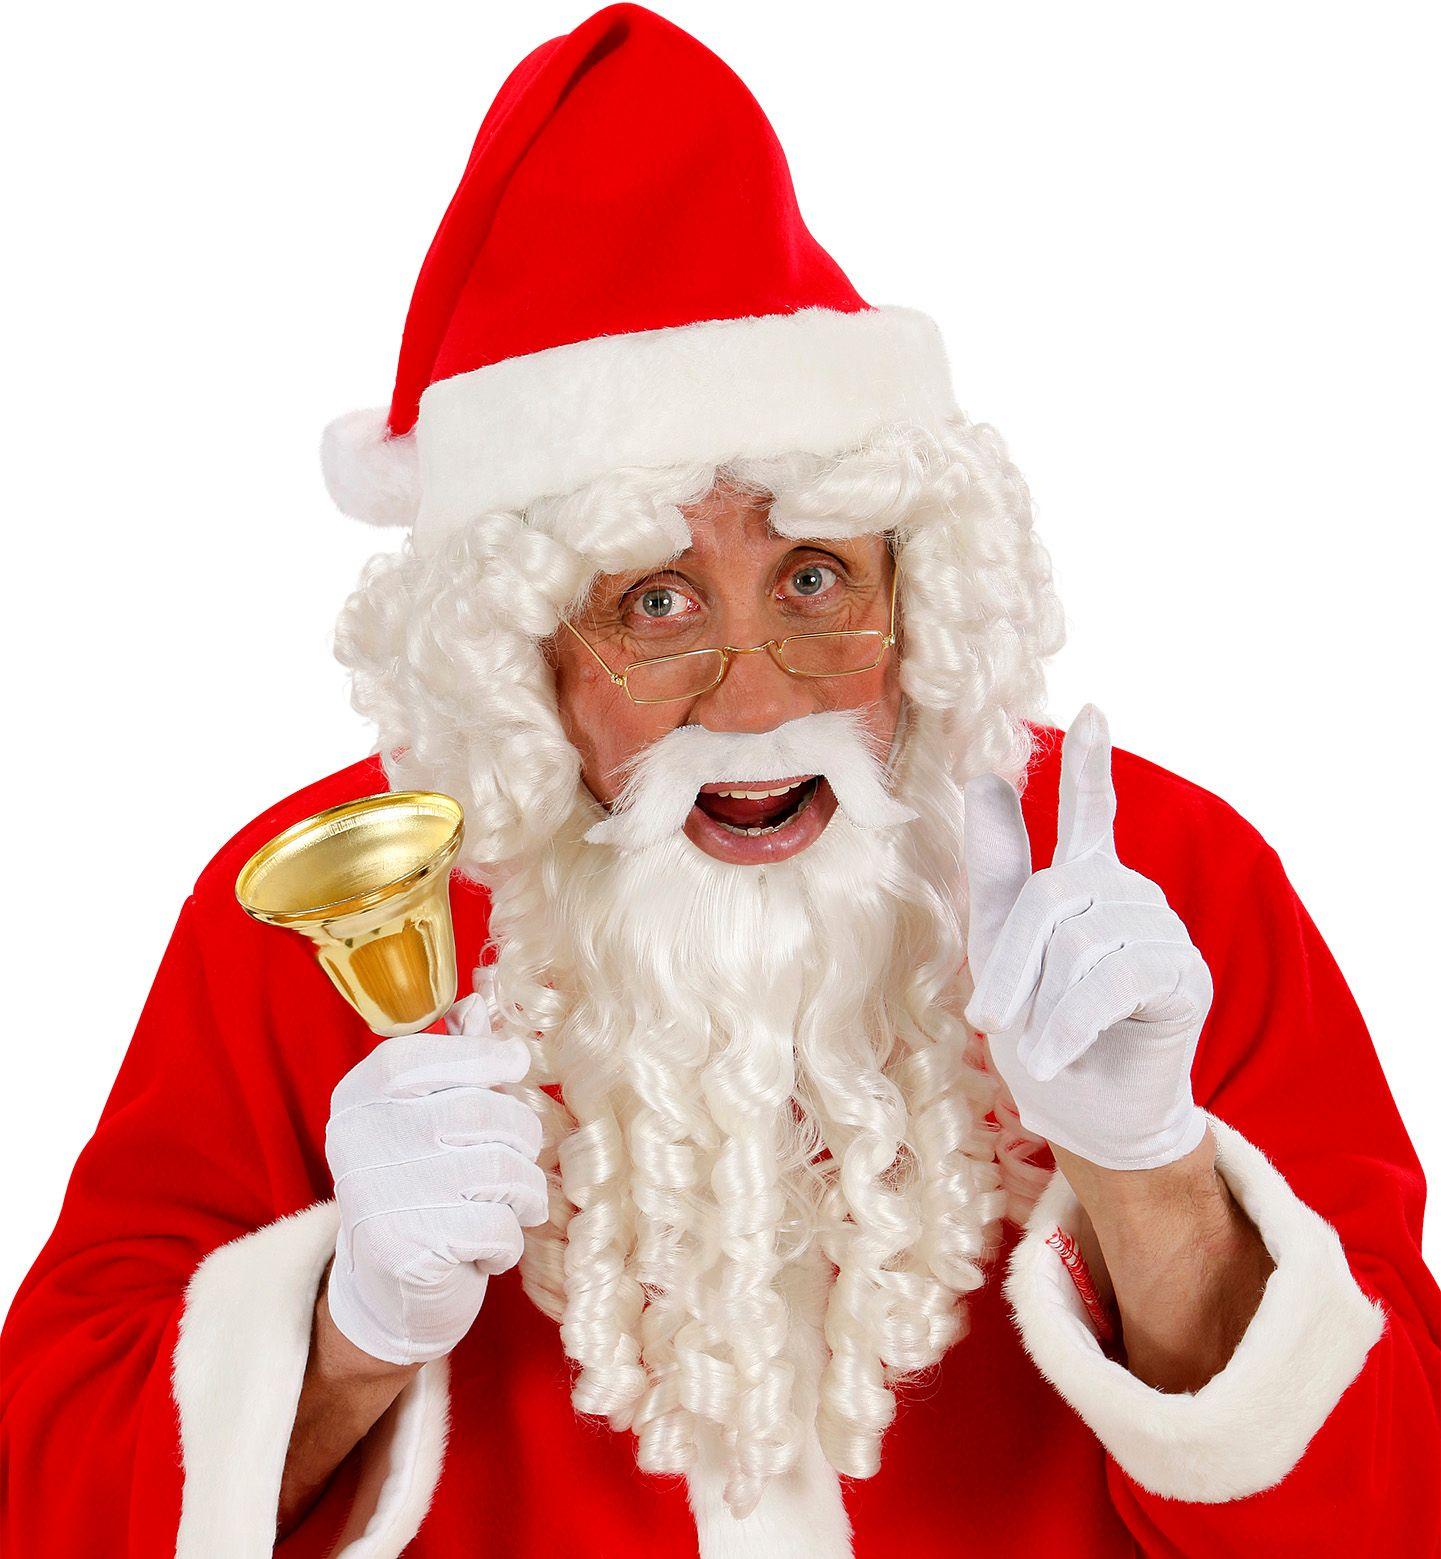 Witte luxe kerstman pruik met baard, snor en wenkbrauwen